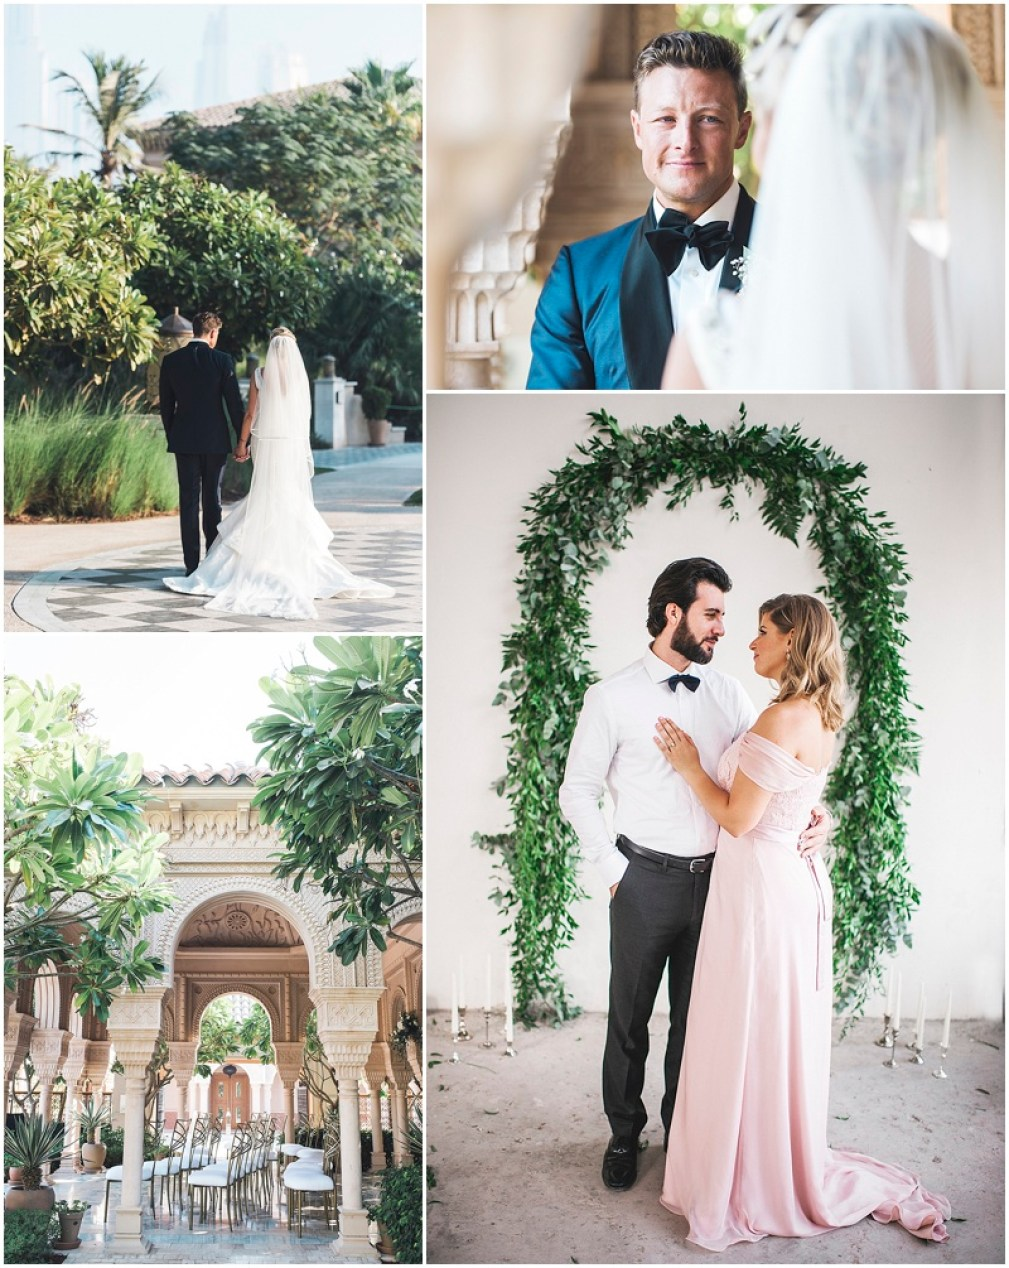 Abbi Kemp - My Lovely Wedding Vendor Dubai